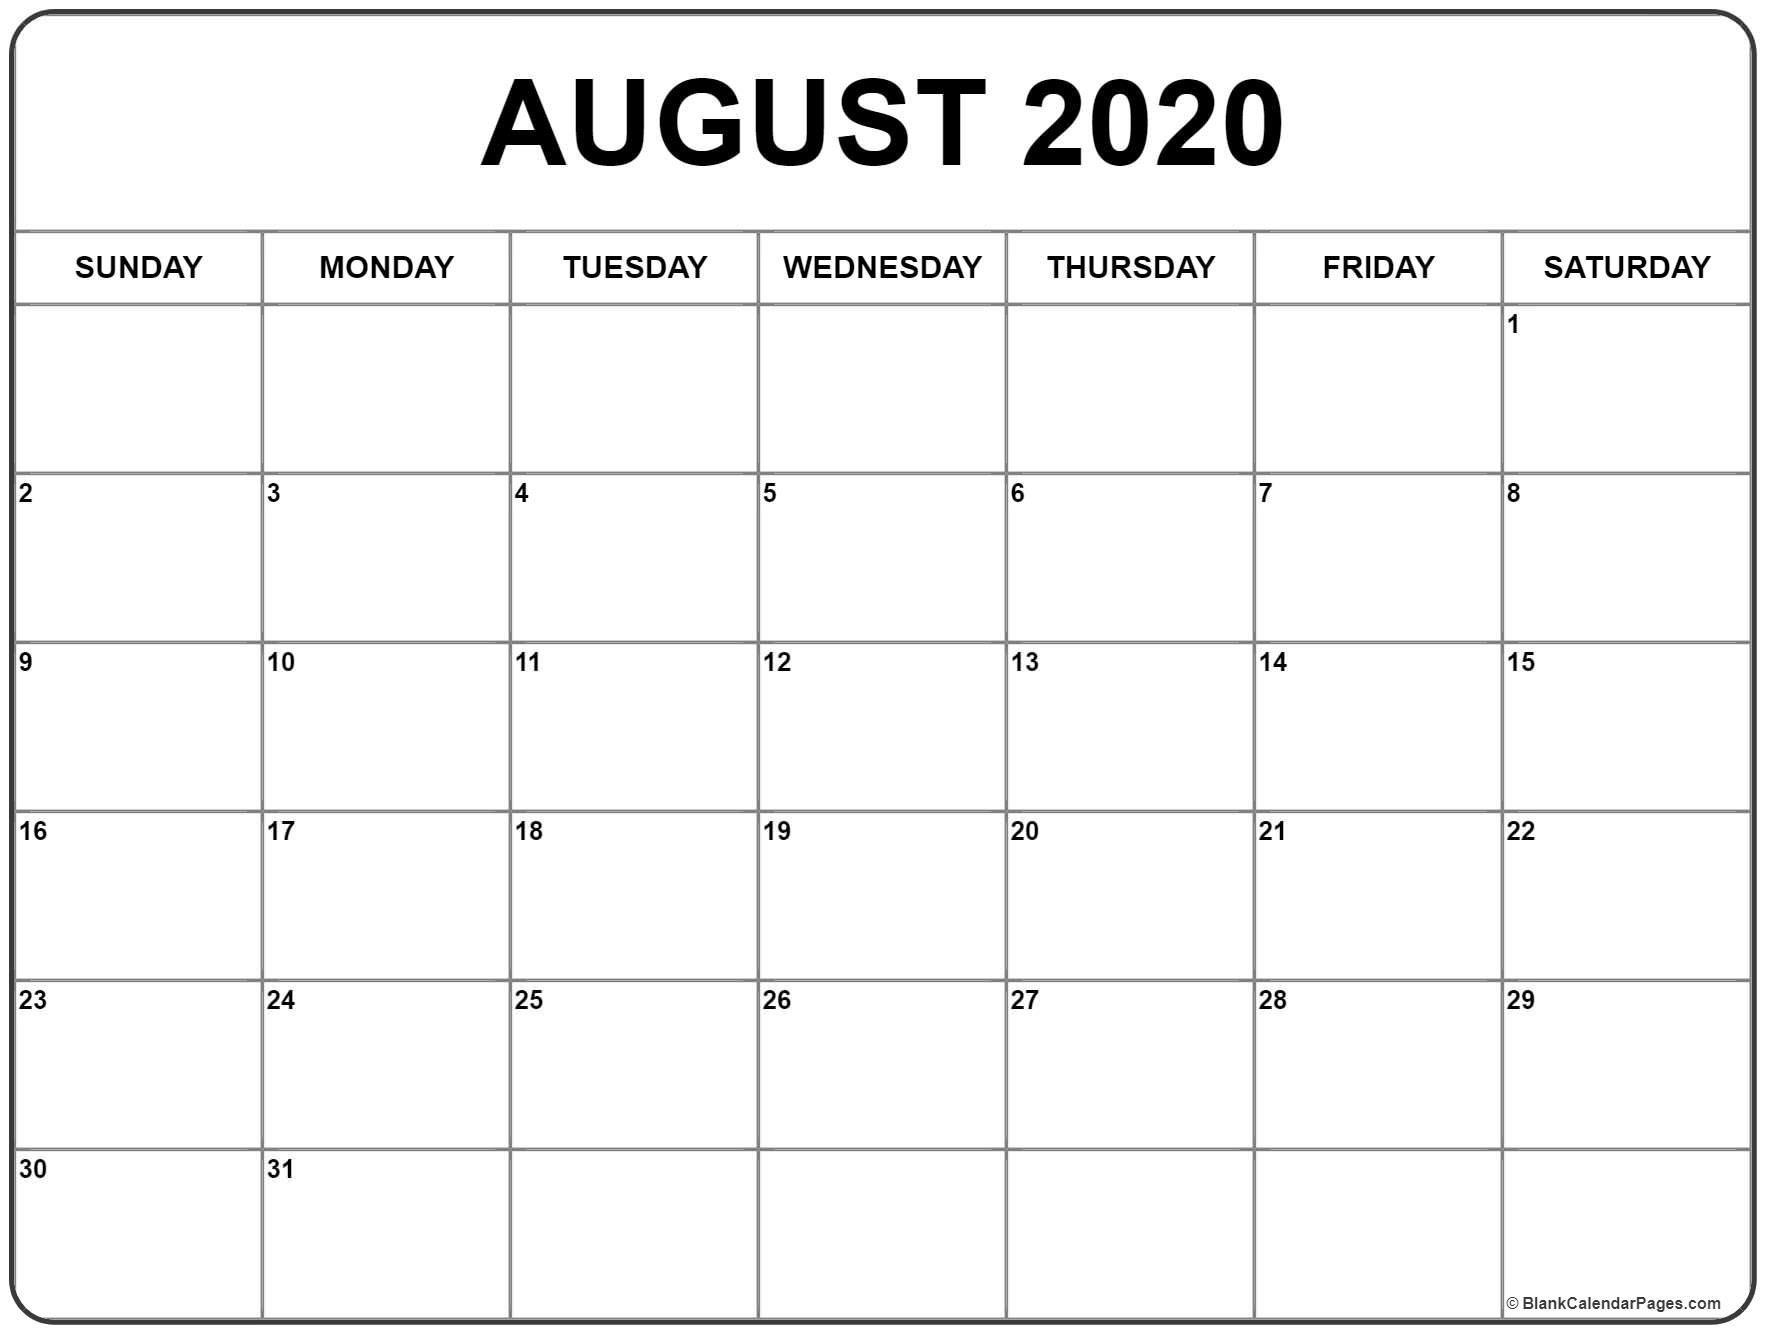 August 2020 Calendar | Free Printable Monthly Calendars within Large Box Calendar 2020 Printable